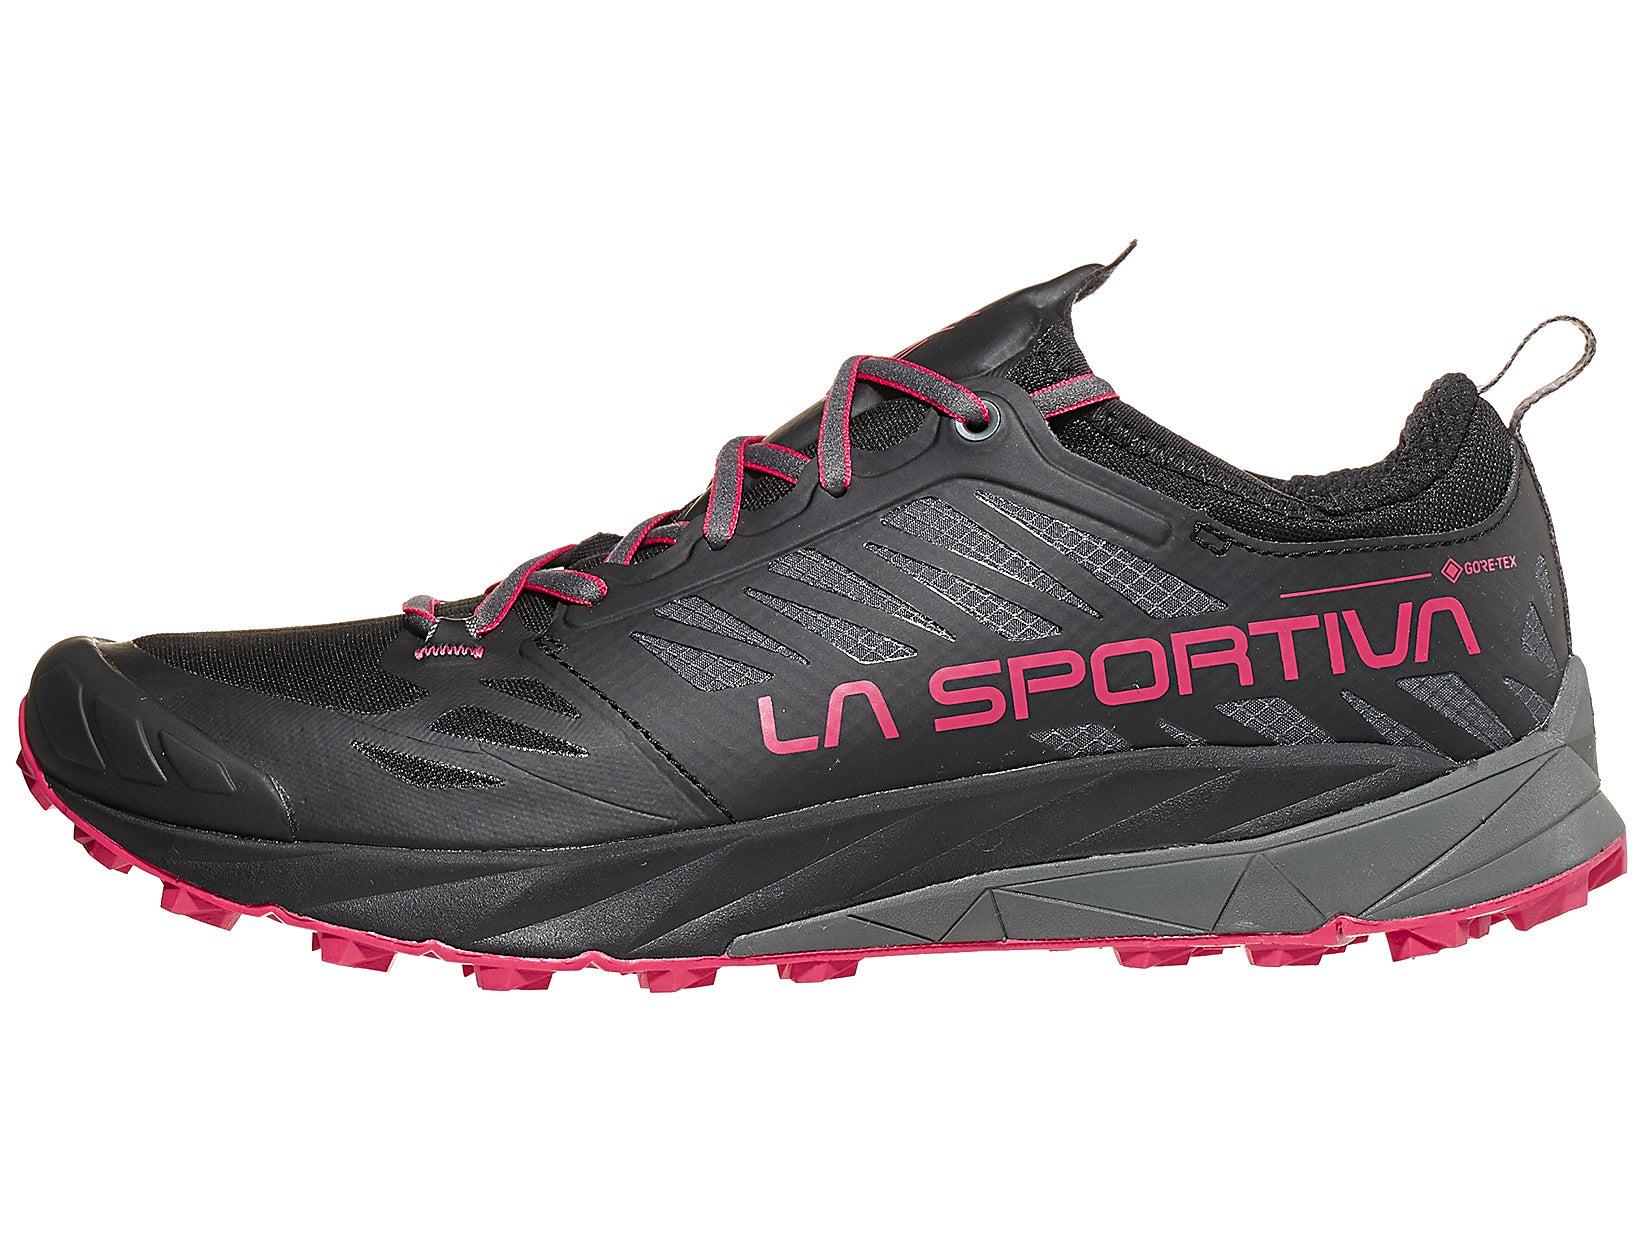 Zapatillas Mujer La Sportiva Kaptiva GTX Women's Shoes Black/Orchid